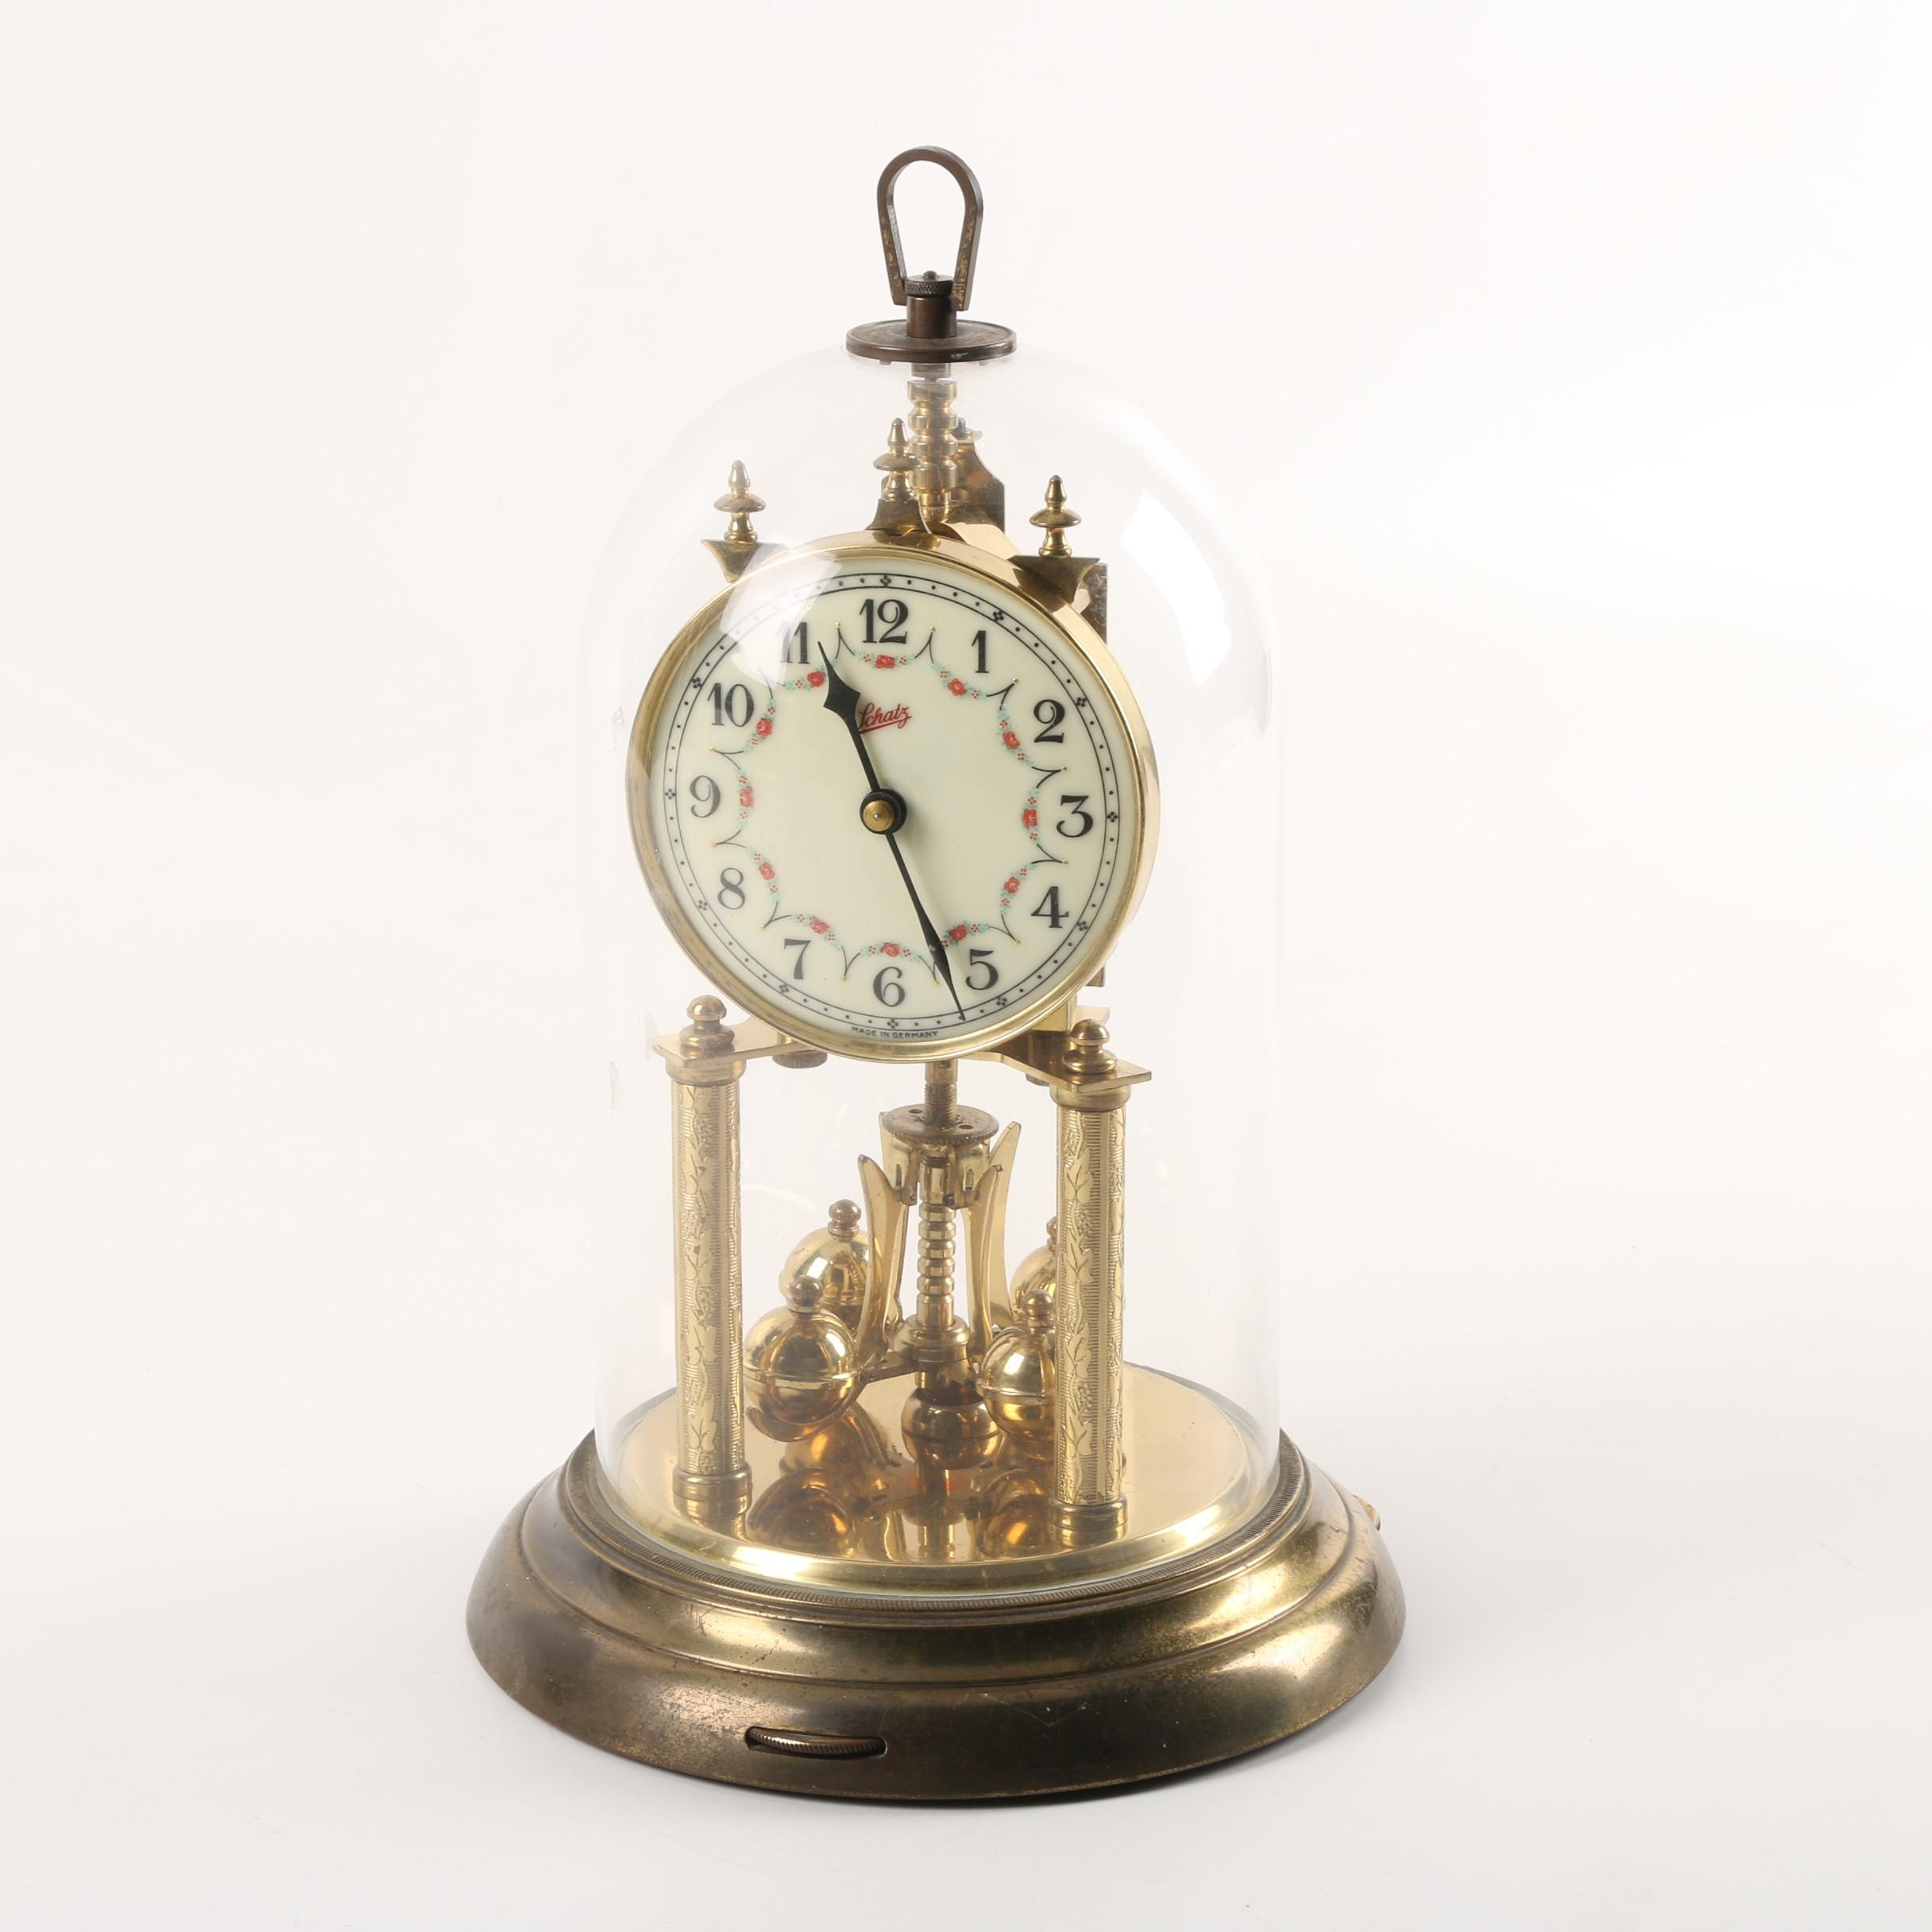 Schatz German Anniversary Clock